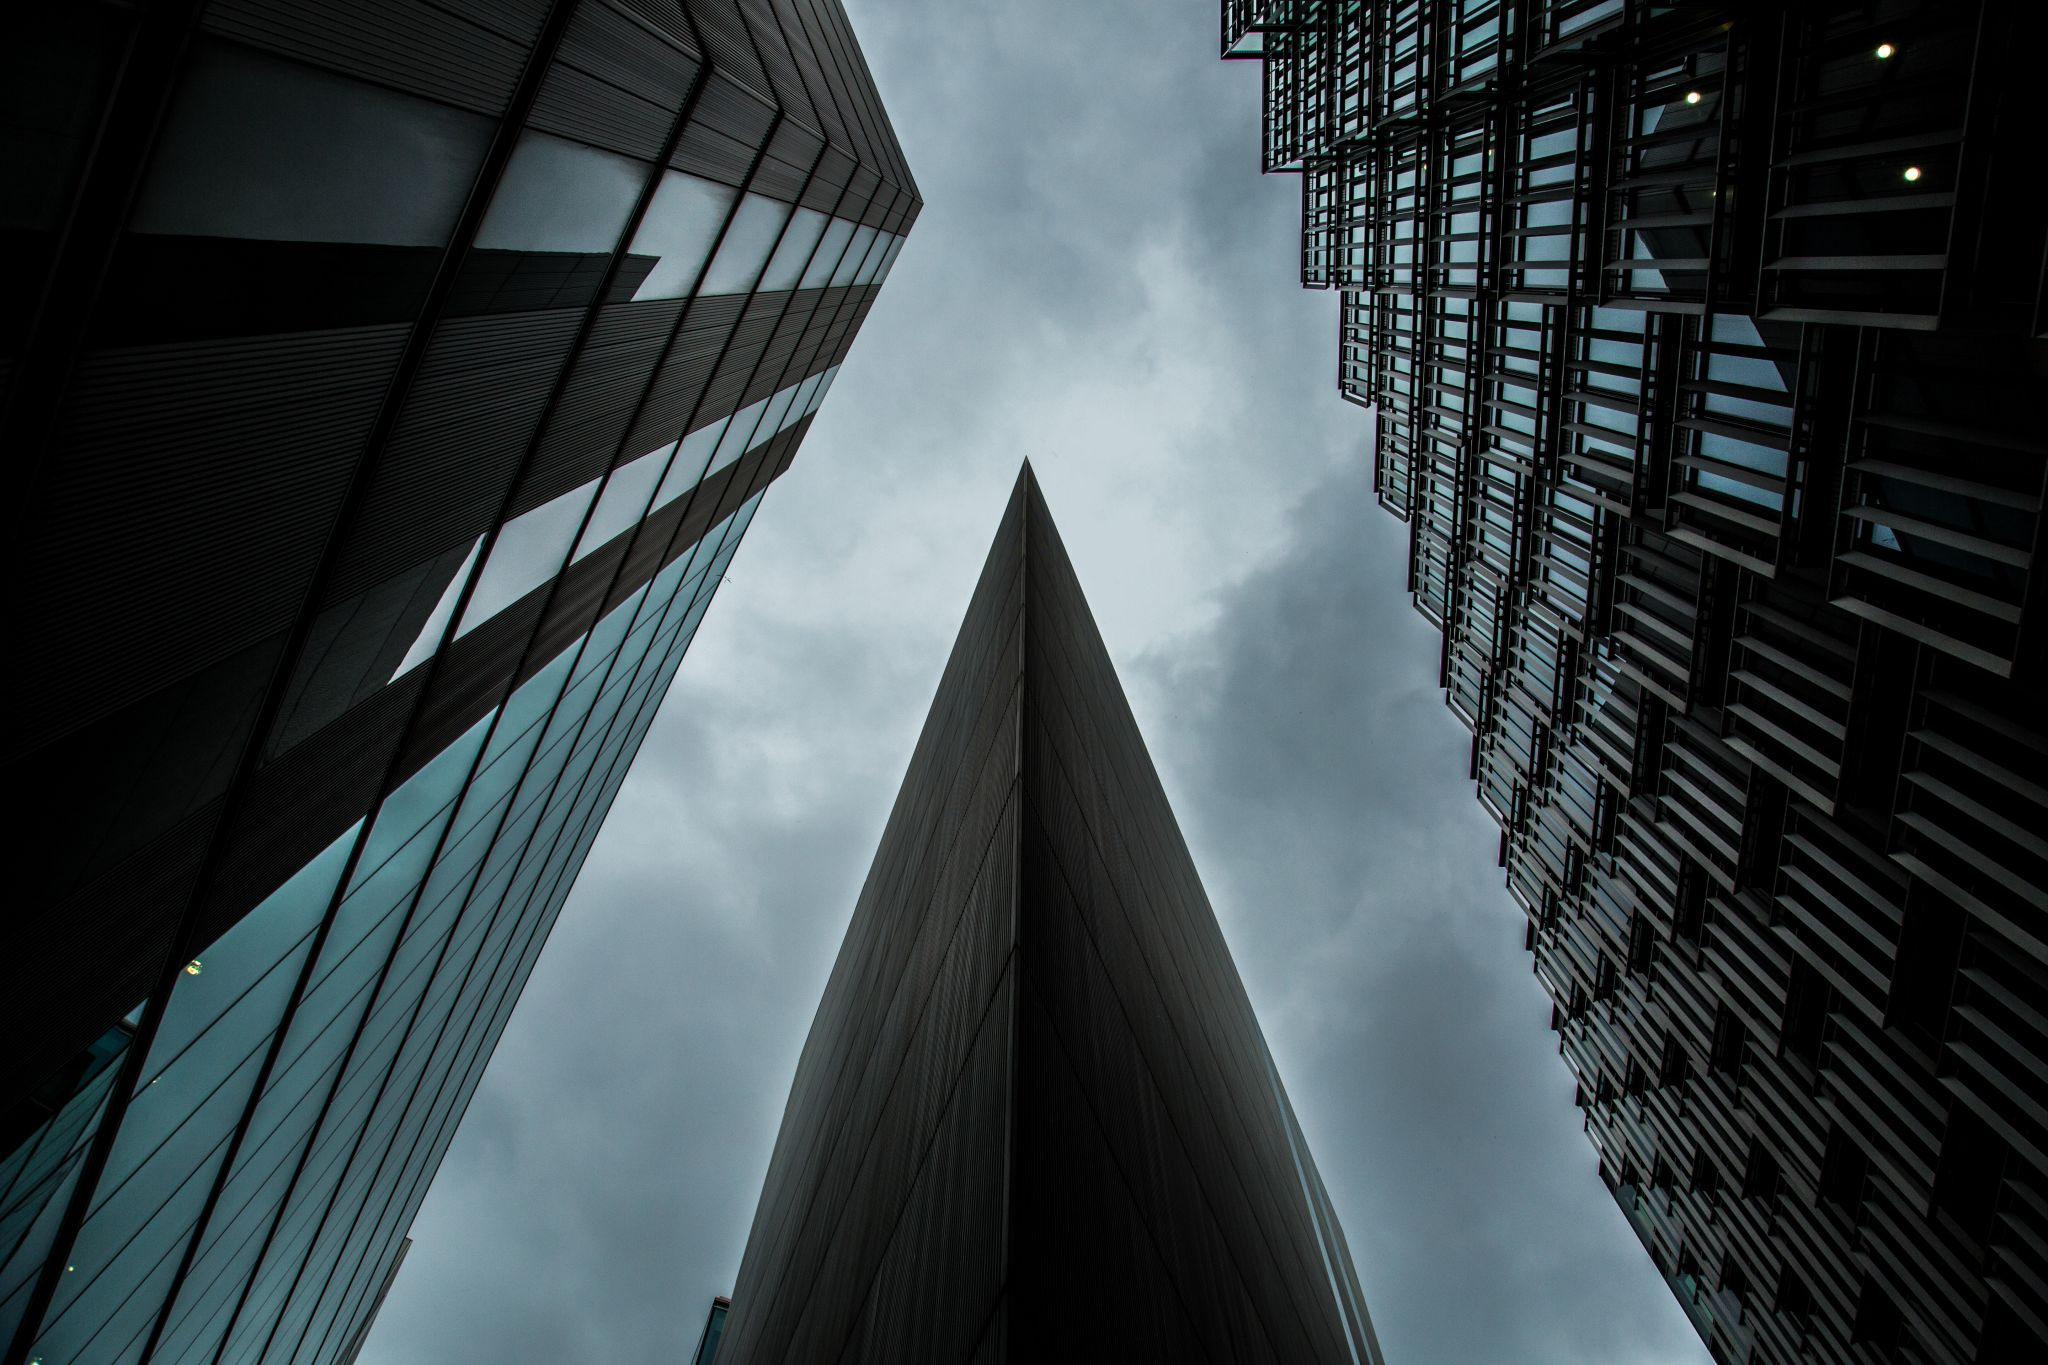 Buildings in London, United Kingdom